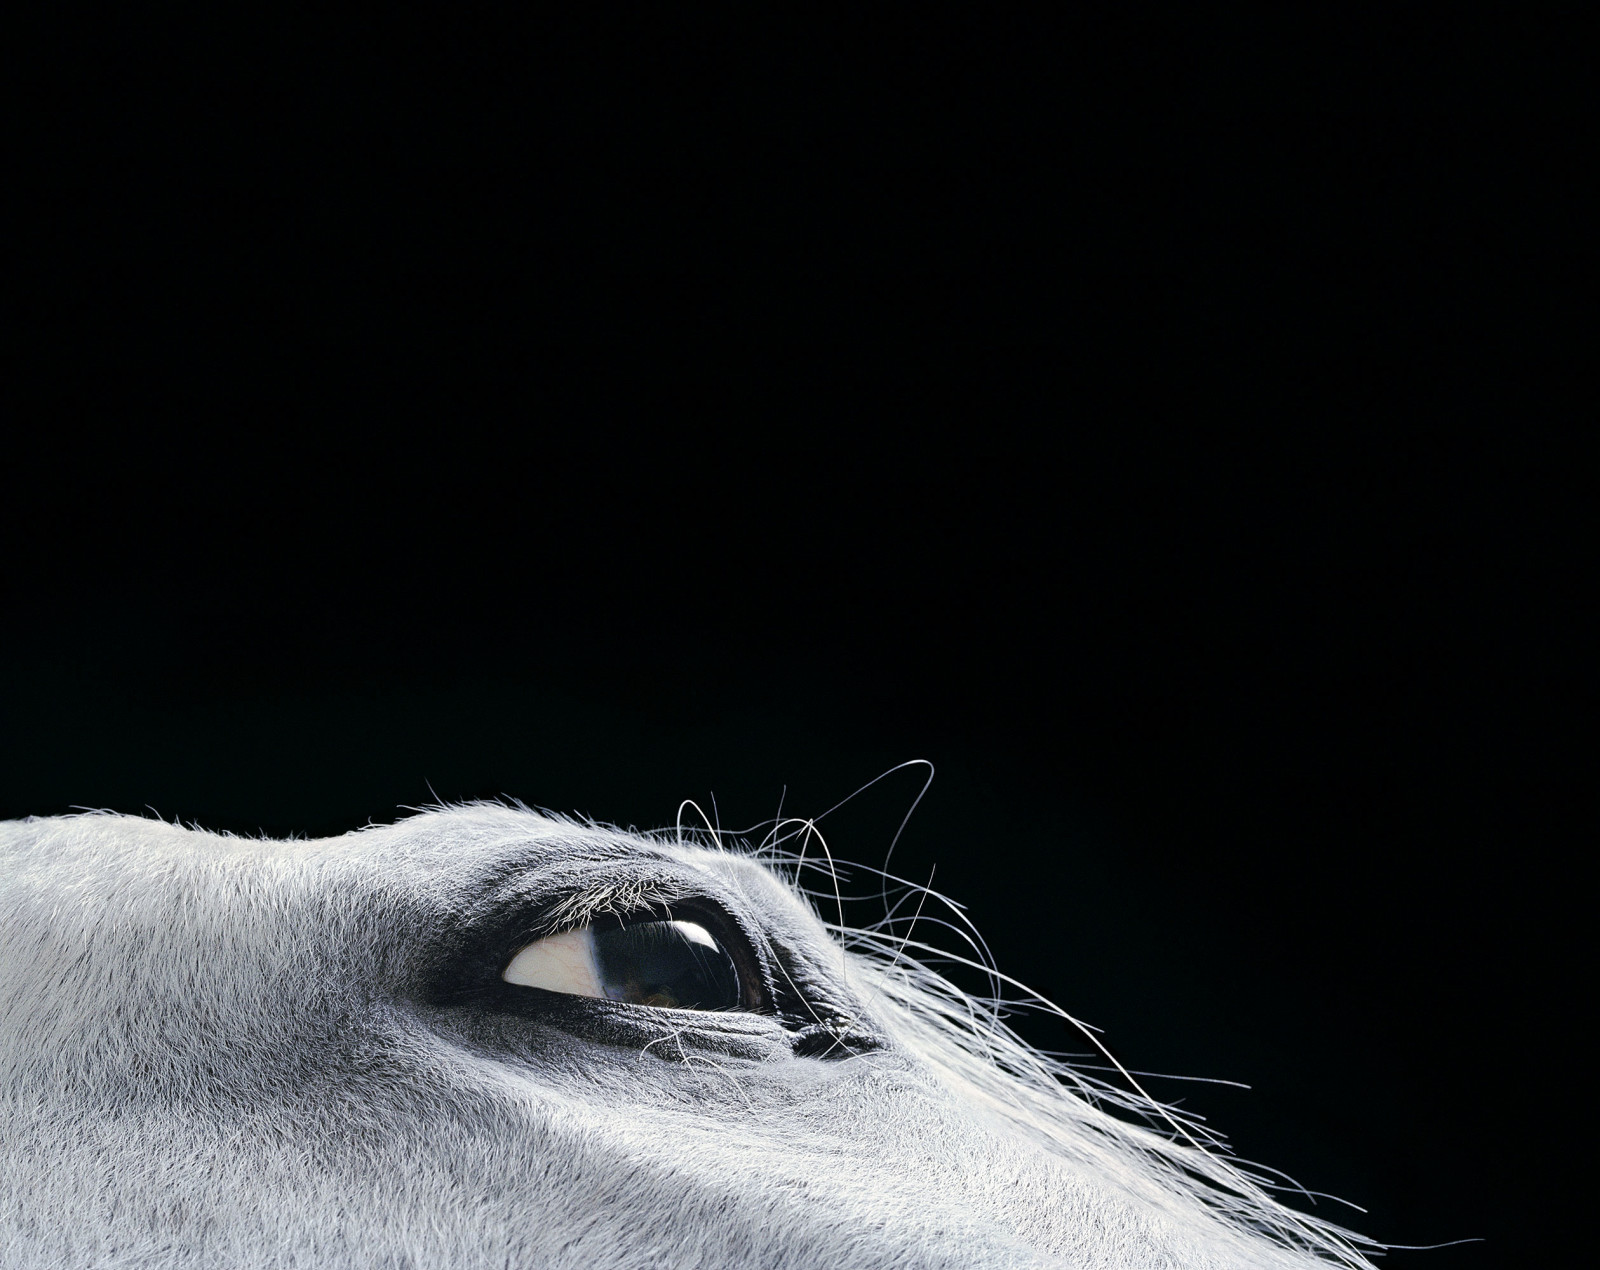 Horse_croc-1600x1270